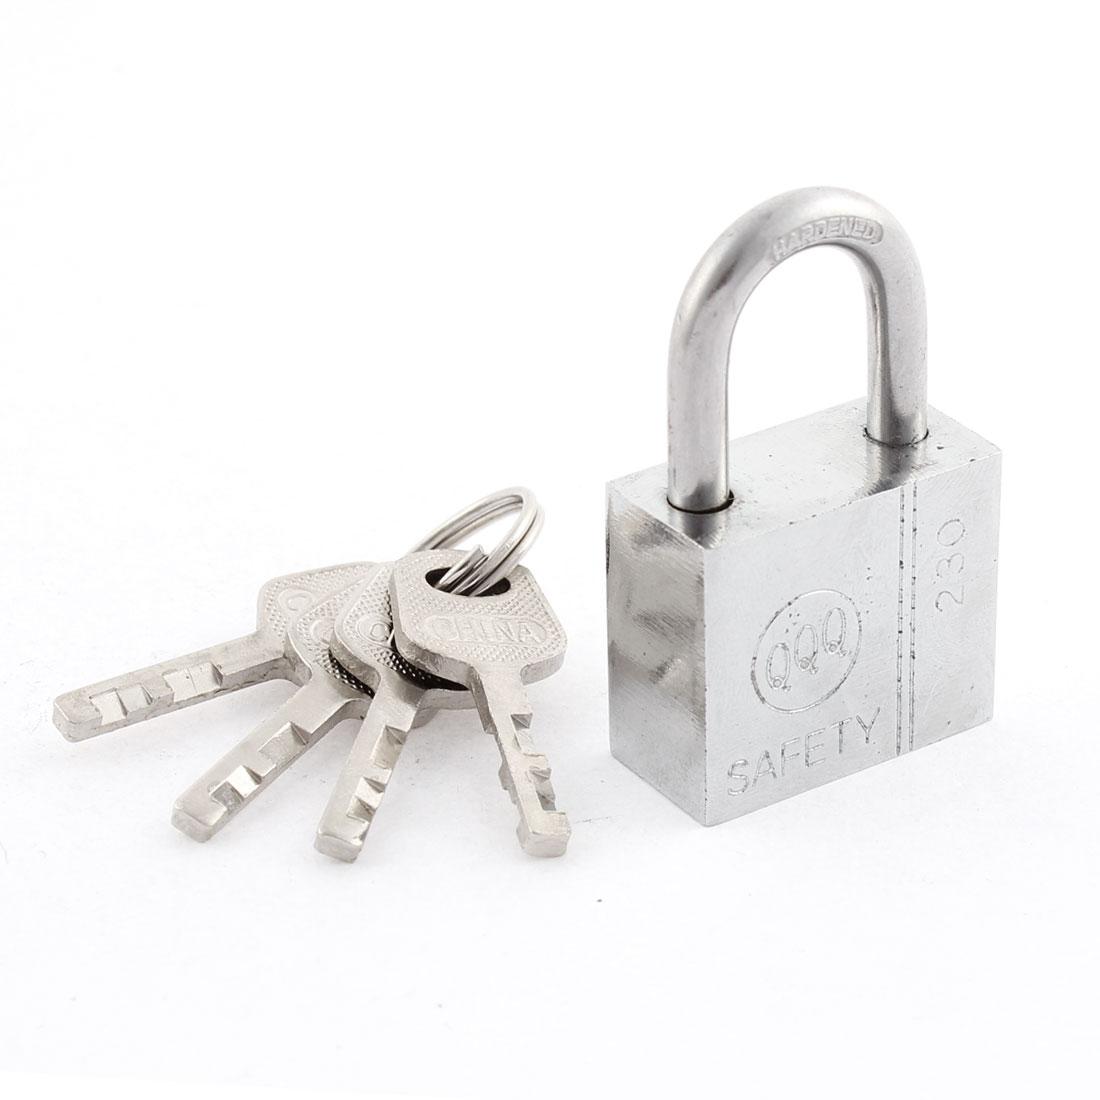 Silver Tone Cabinet Door Drawer Closet Security Locking Padlock w 4 Keys